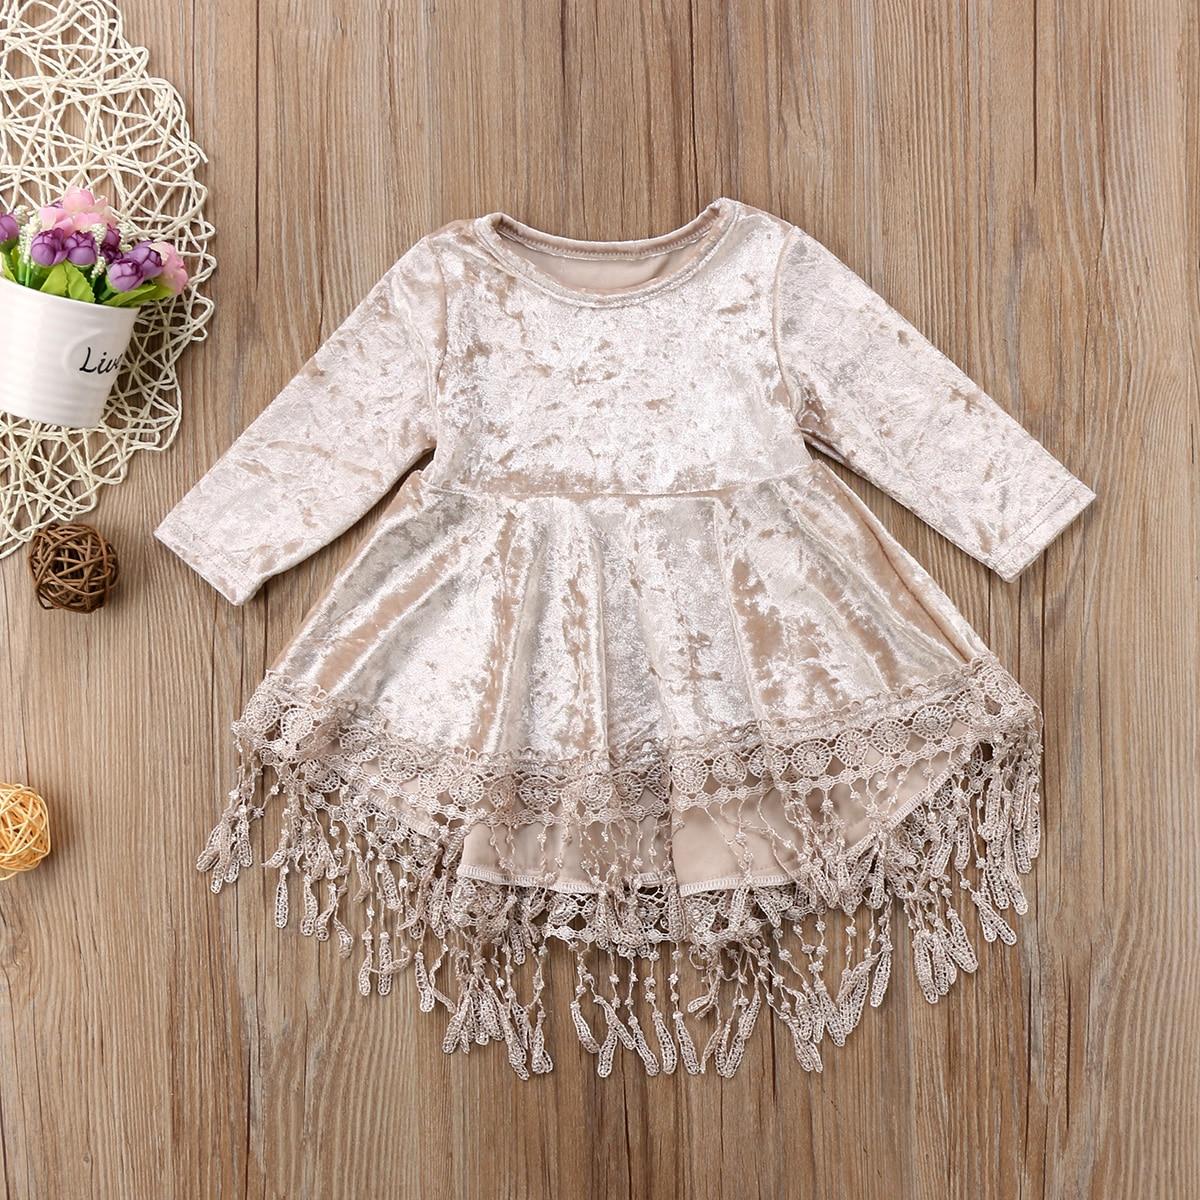 Flower     Girl     Dress   Velvet Princess Baby Pageant Wedding   Dresses   Sliver   Dress   Gowns High Quantity   Dresses